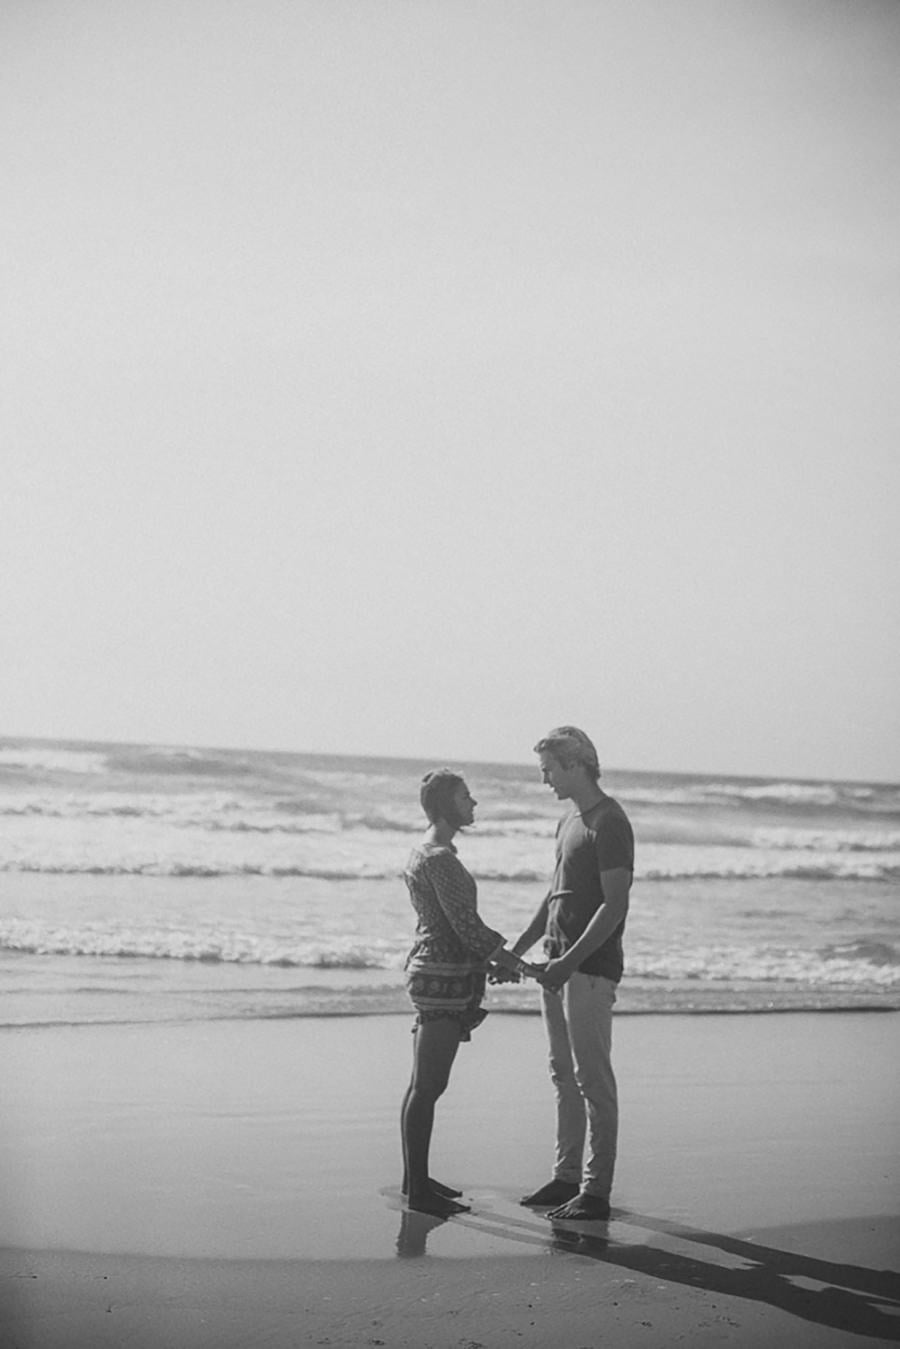 Artistic_Couples_Photography_Byron_Bay_Maureen_Du_Preez-22